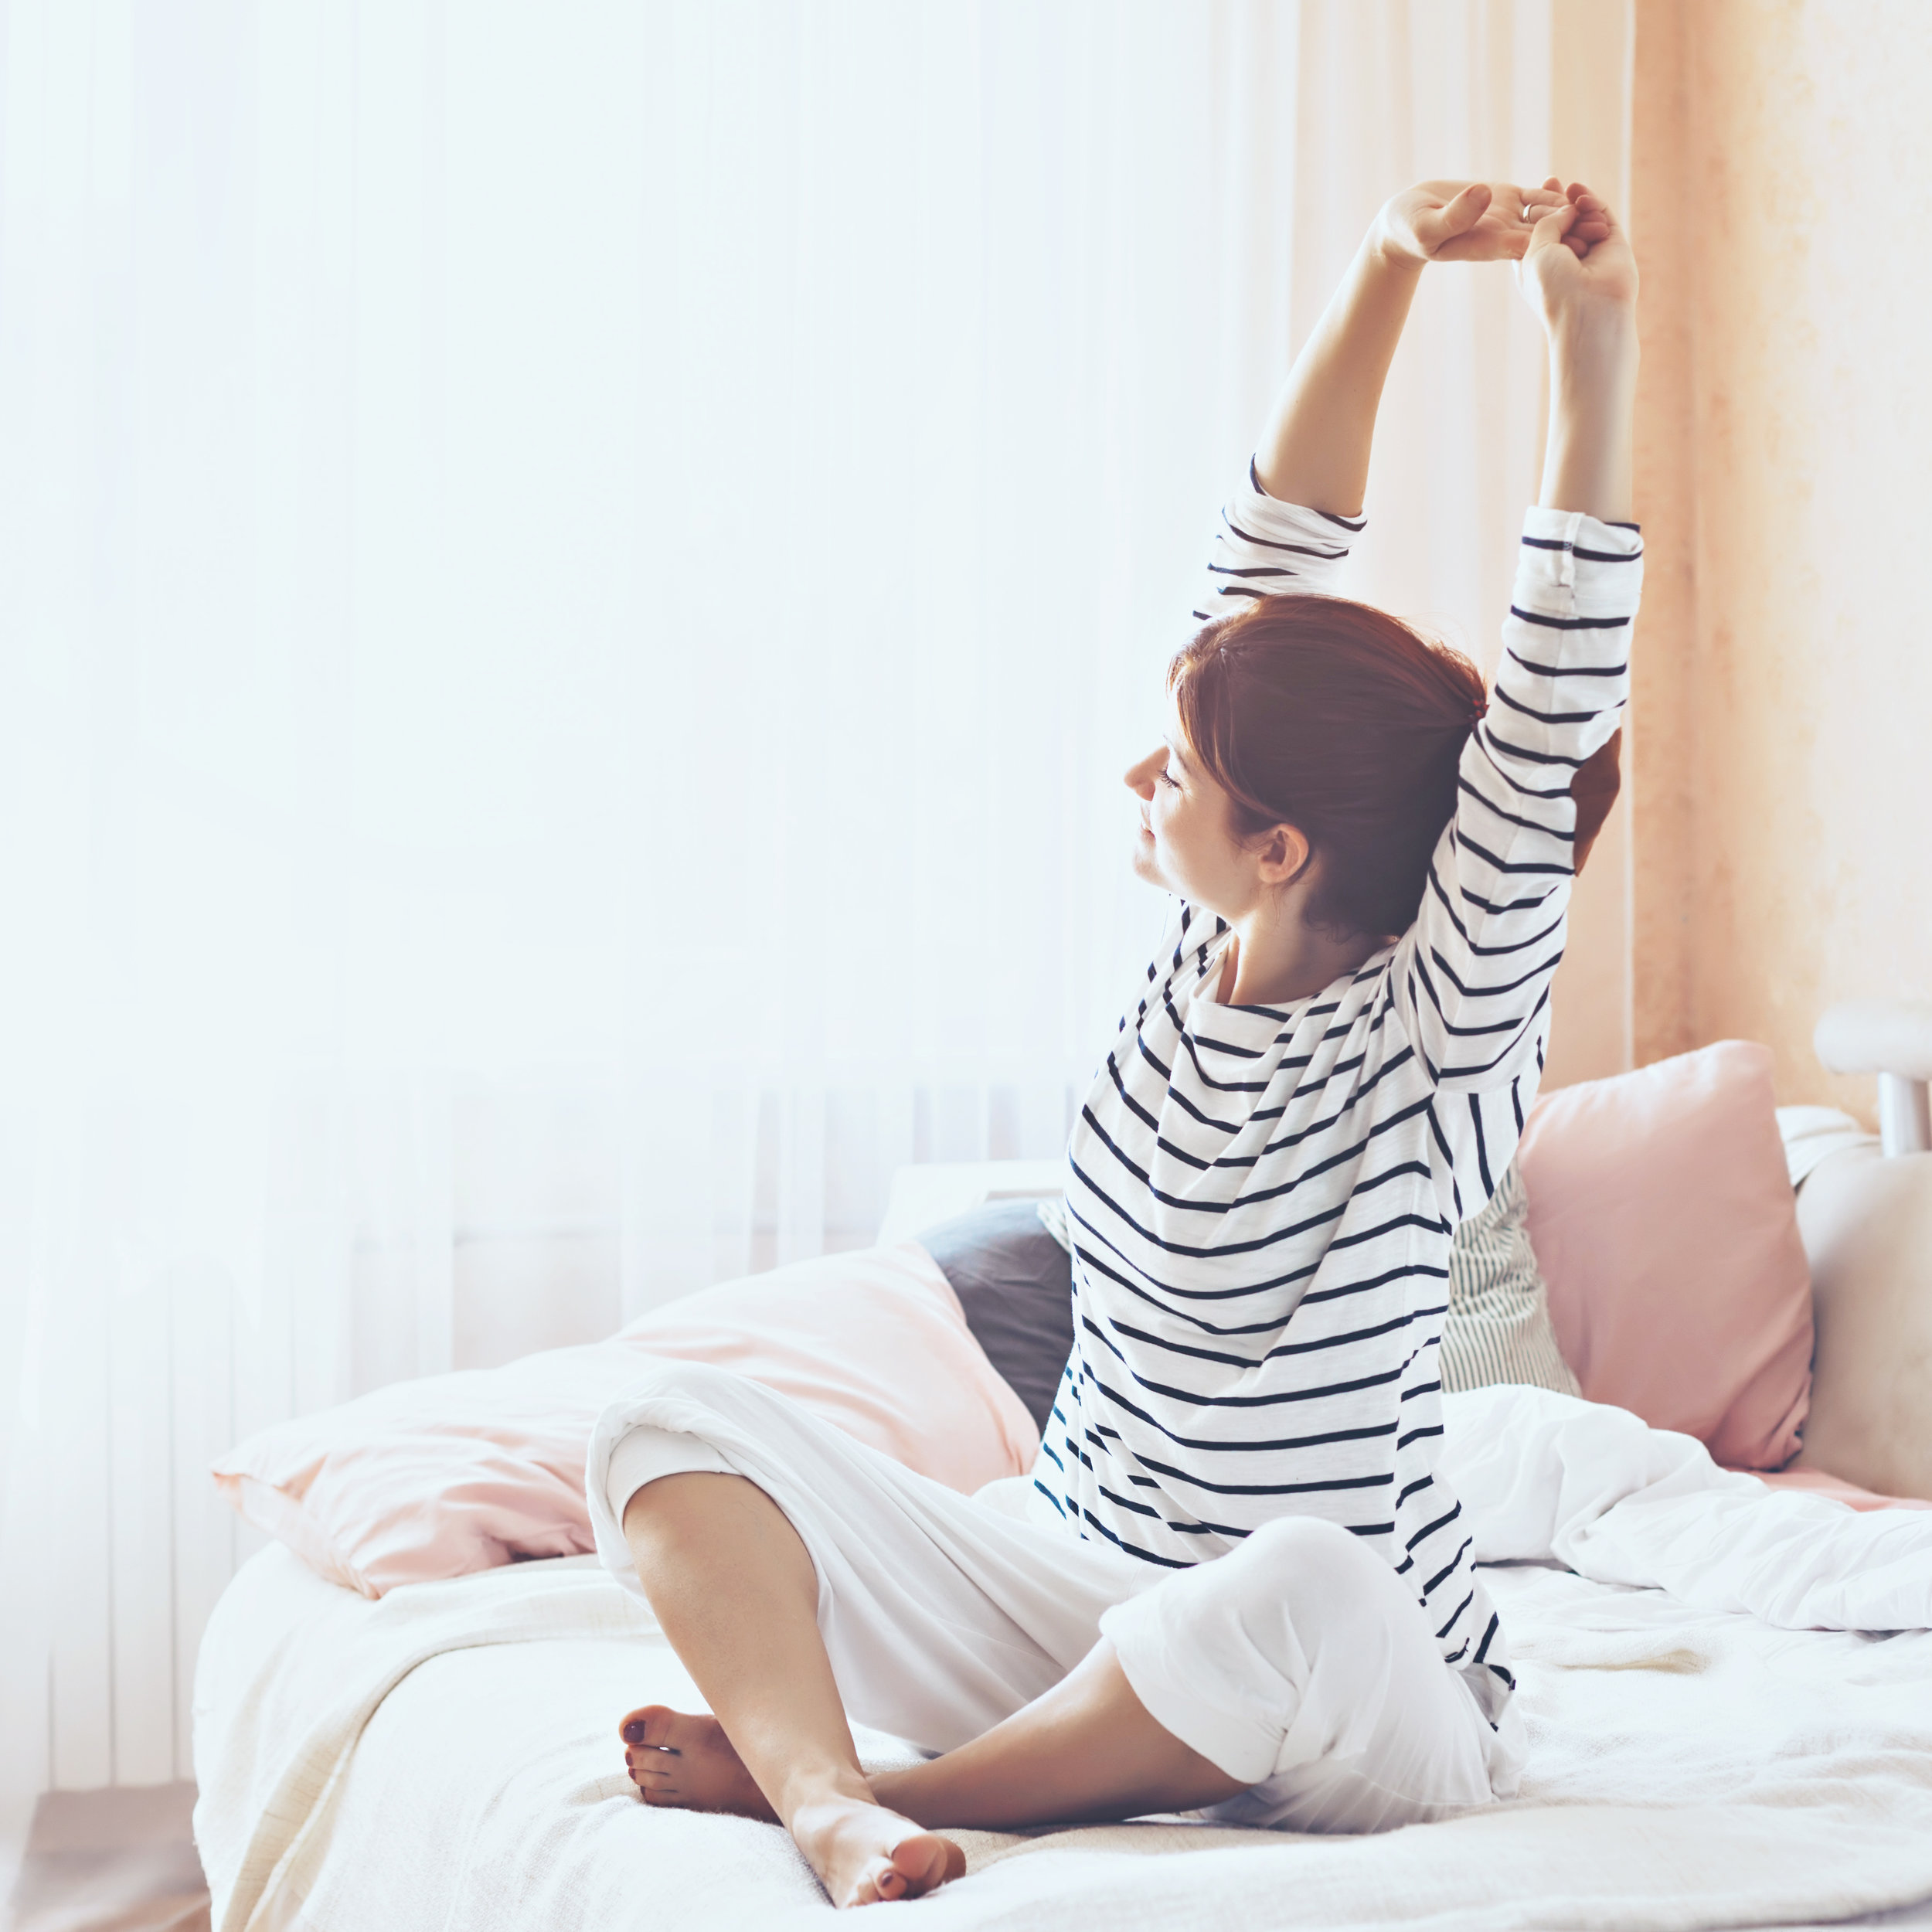 bigstock-Woman-doing-yoga-exercise-on-b-189600895.jpg